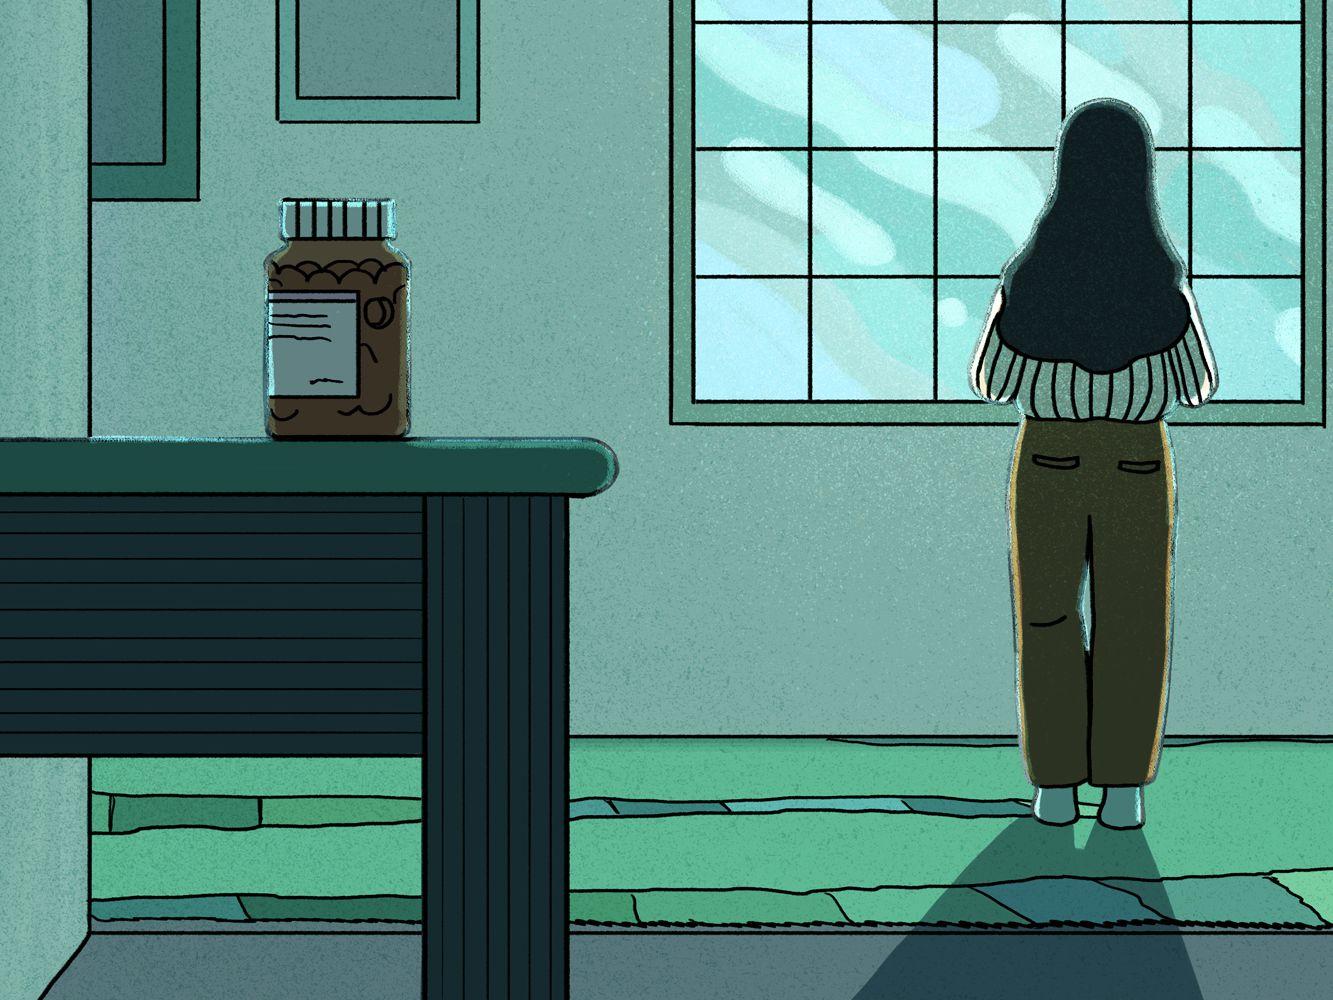 Ways to treat depression without medication